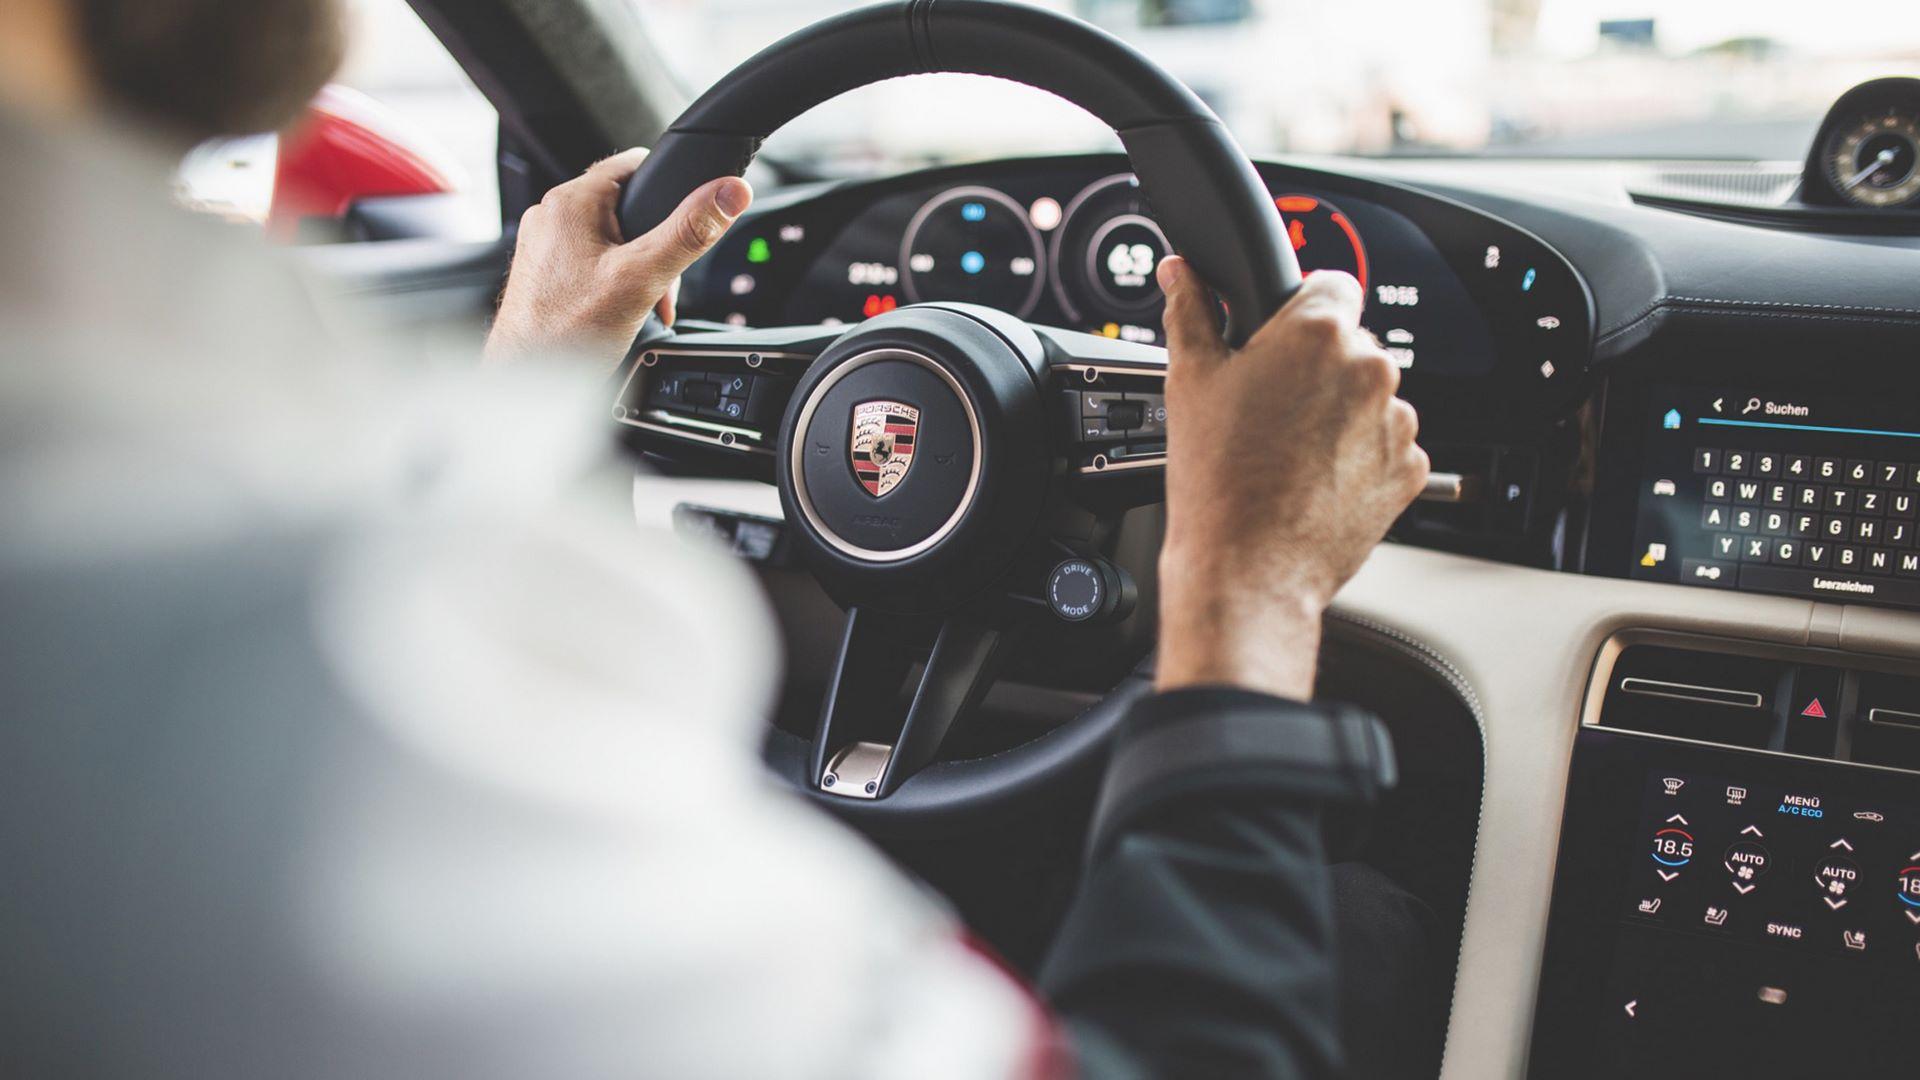 Porsche-Taycan-Turbo-safety-car-Le-Mans-2020-7